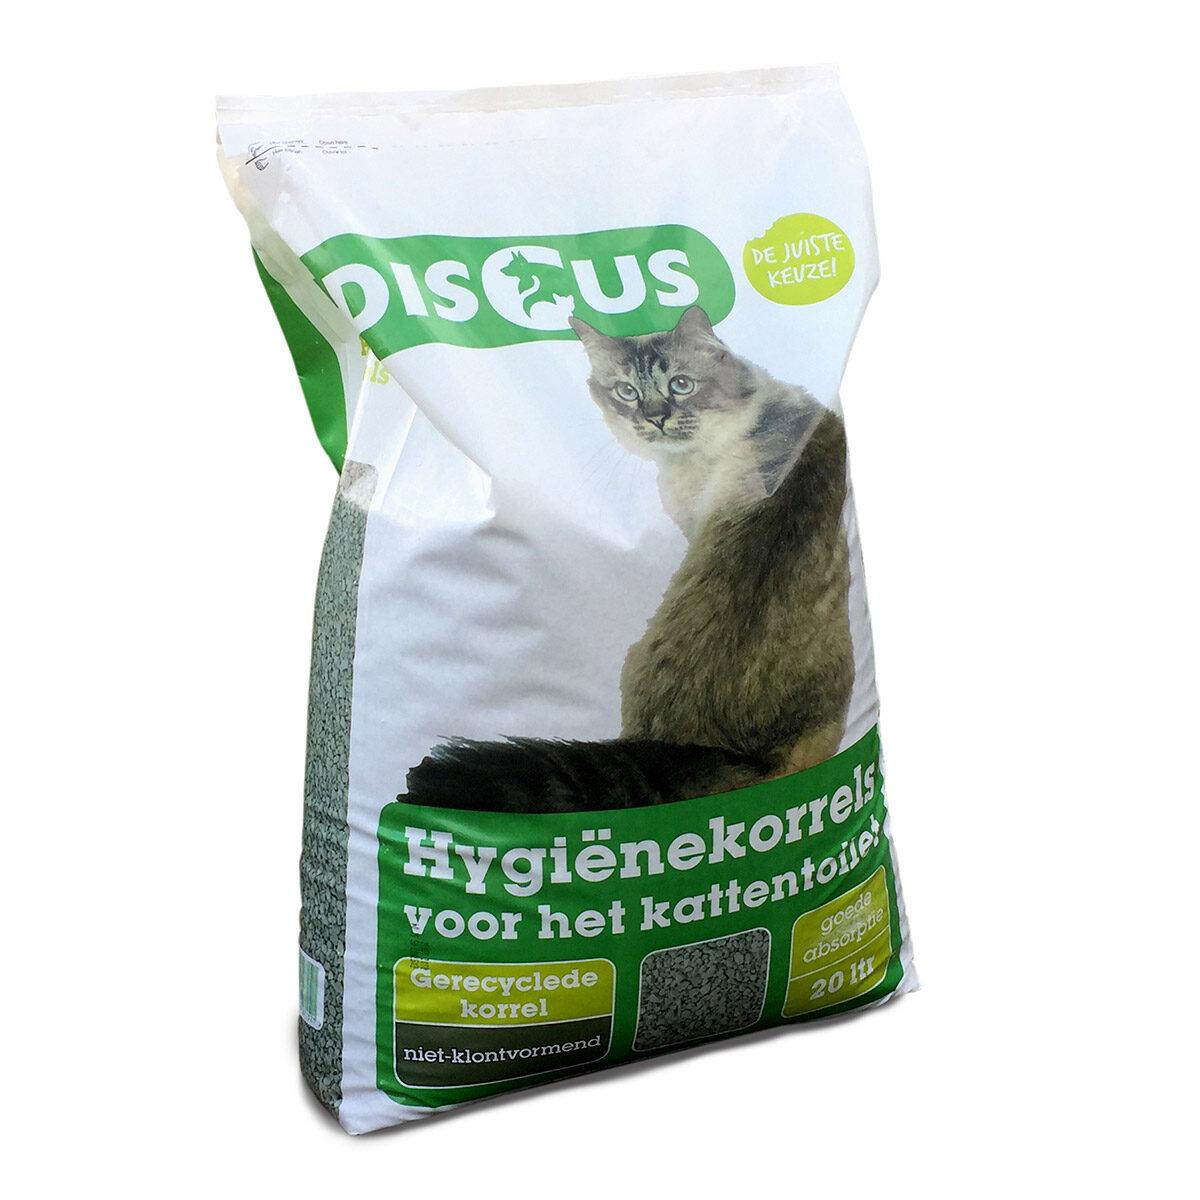 Discus Kattenbakvulling Niet-Klontvormend 20liter